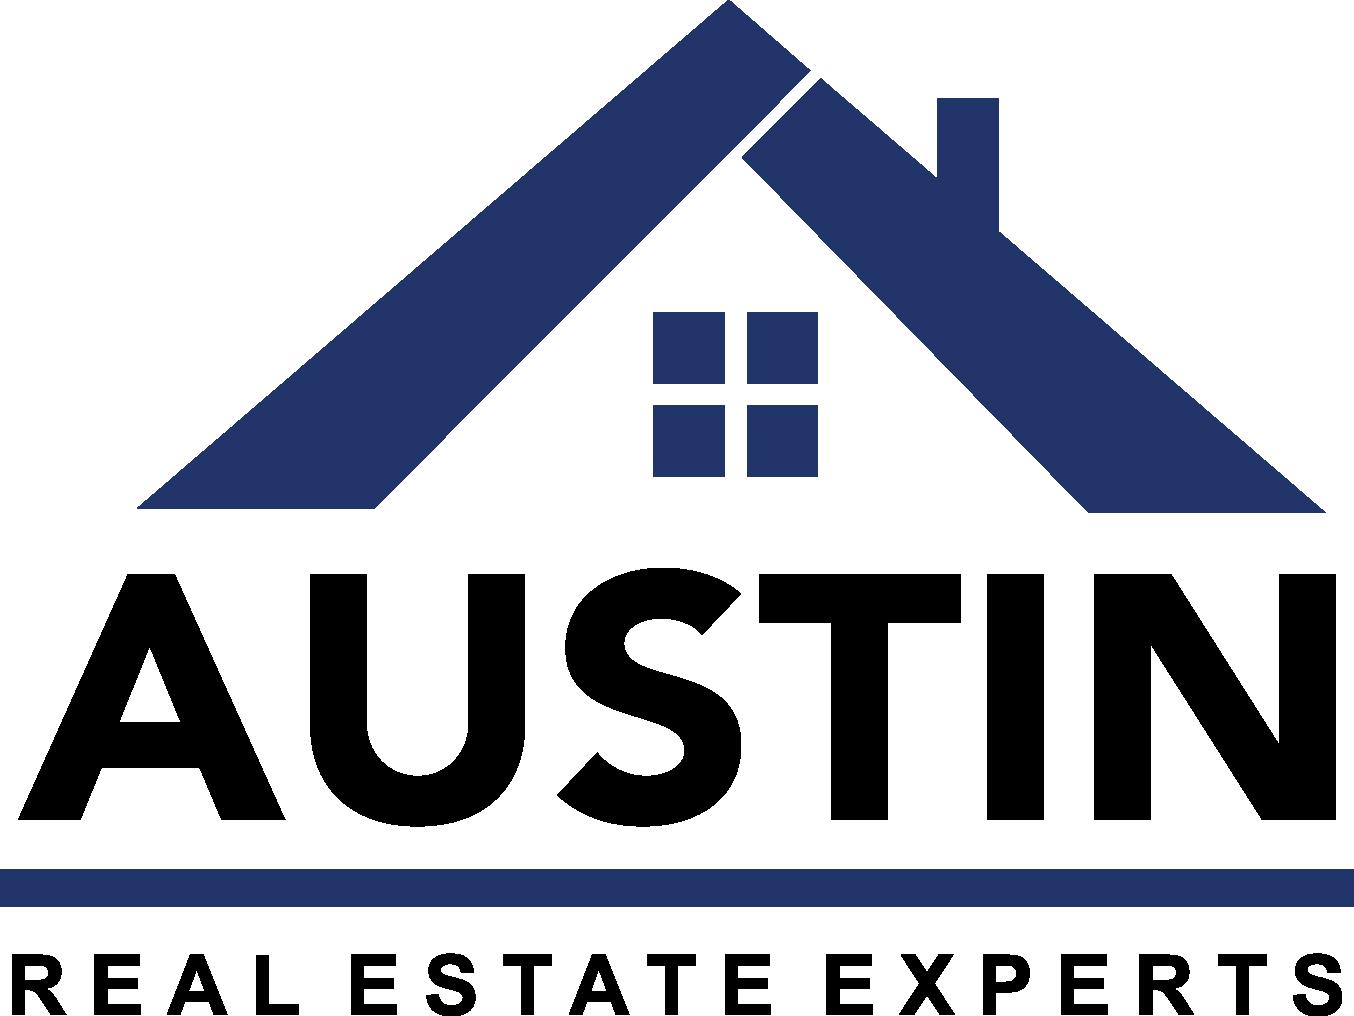 Austin Real Estate Experts logo